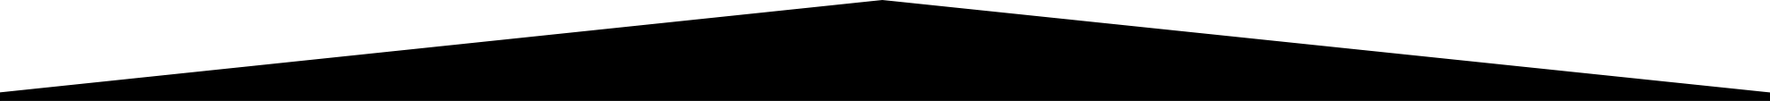 72aa9-bttm-triangle.png